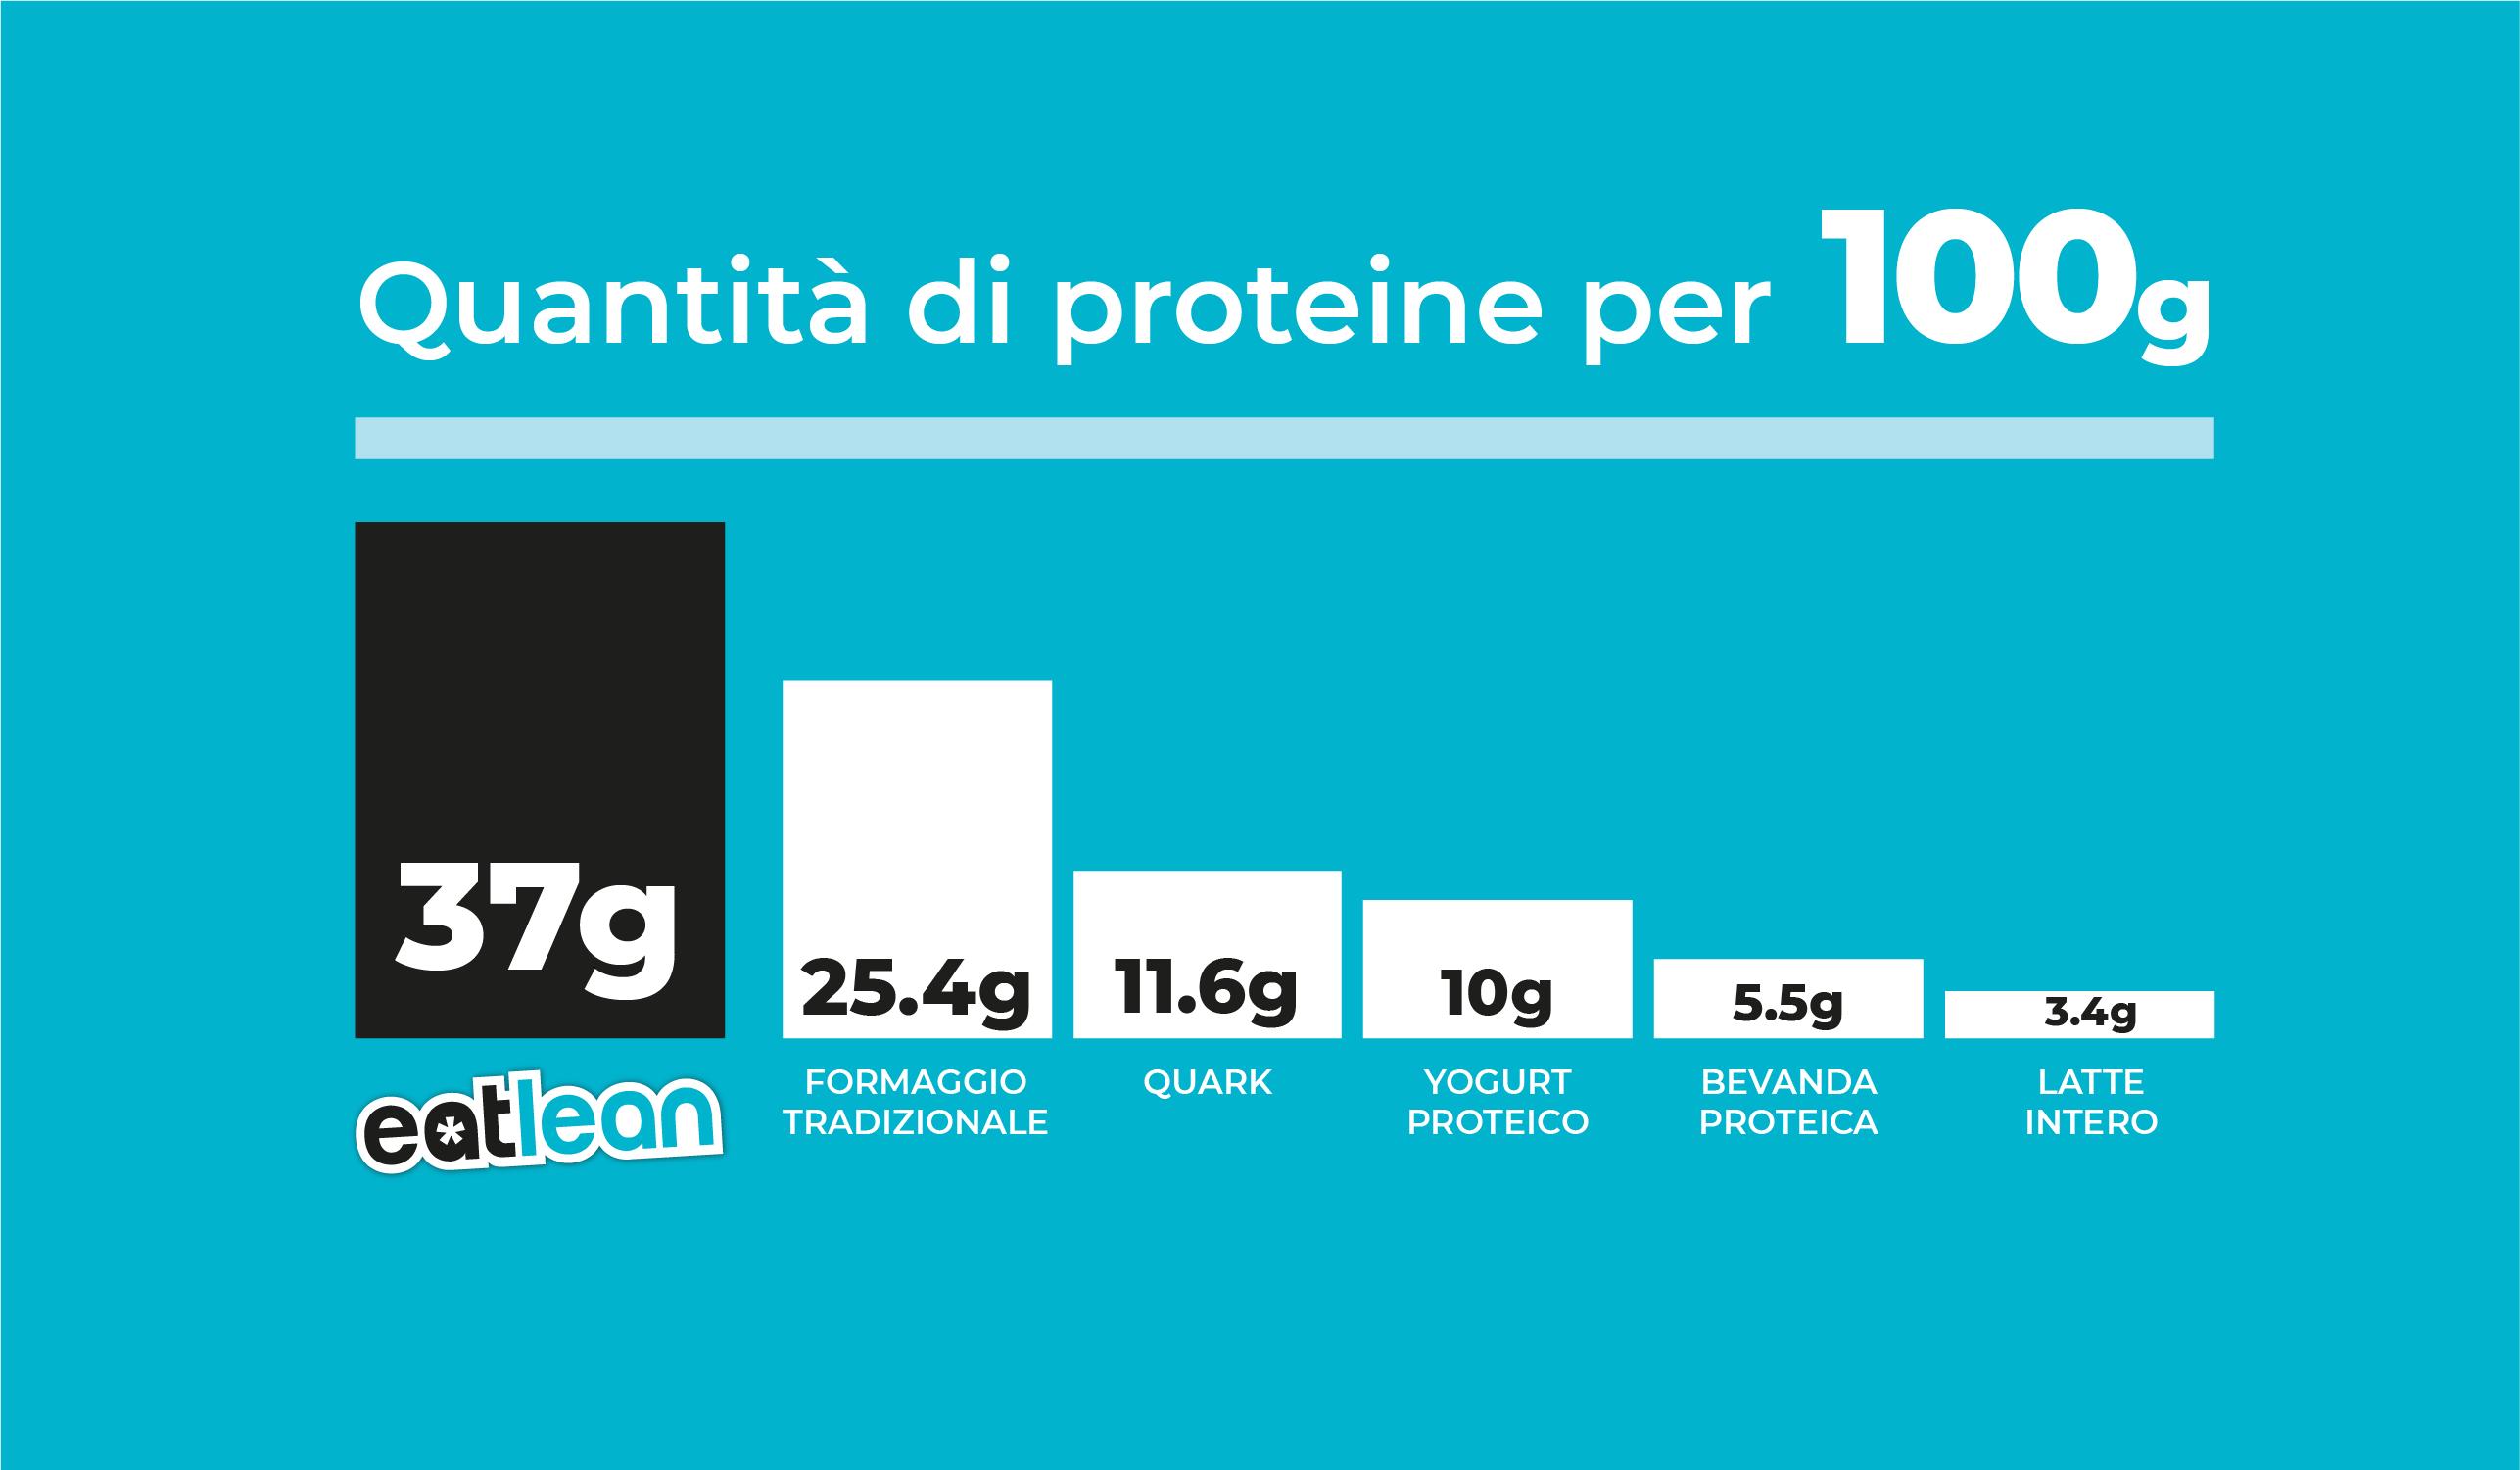 Proteine, come e quando mangiarle?